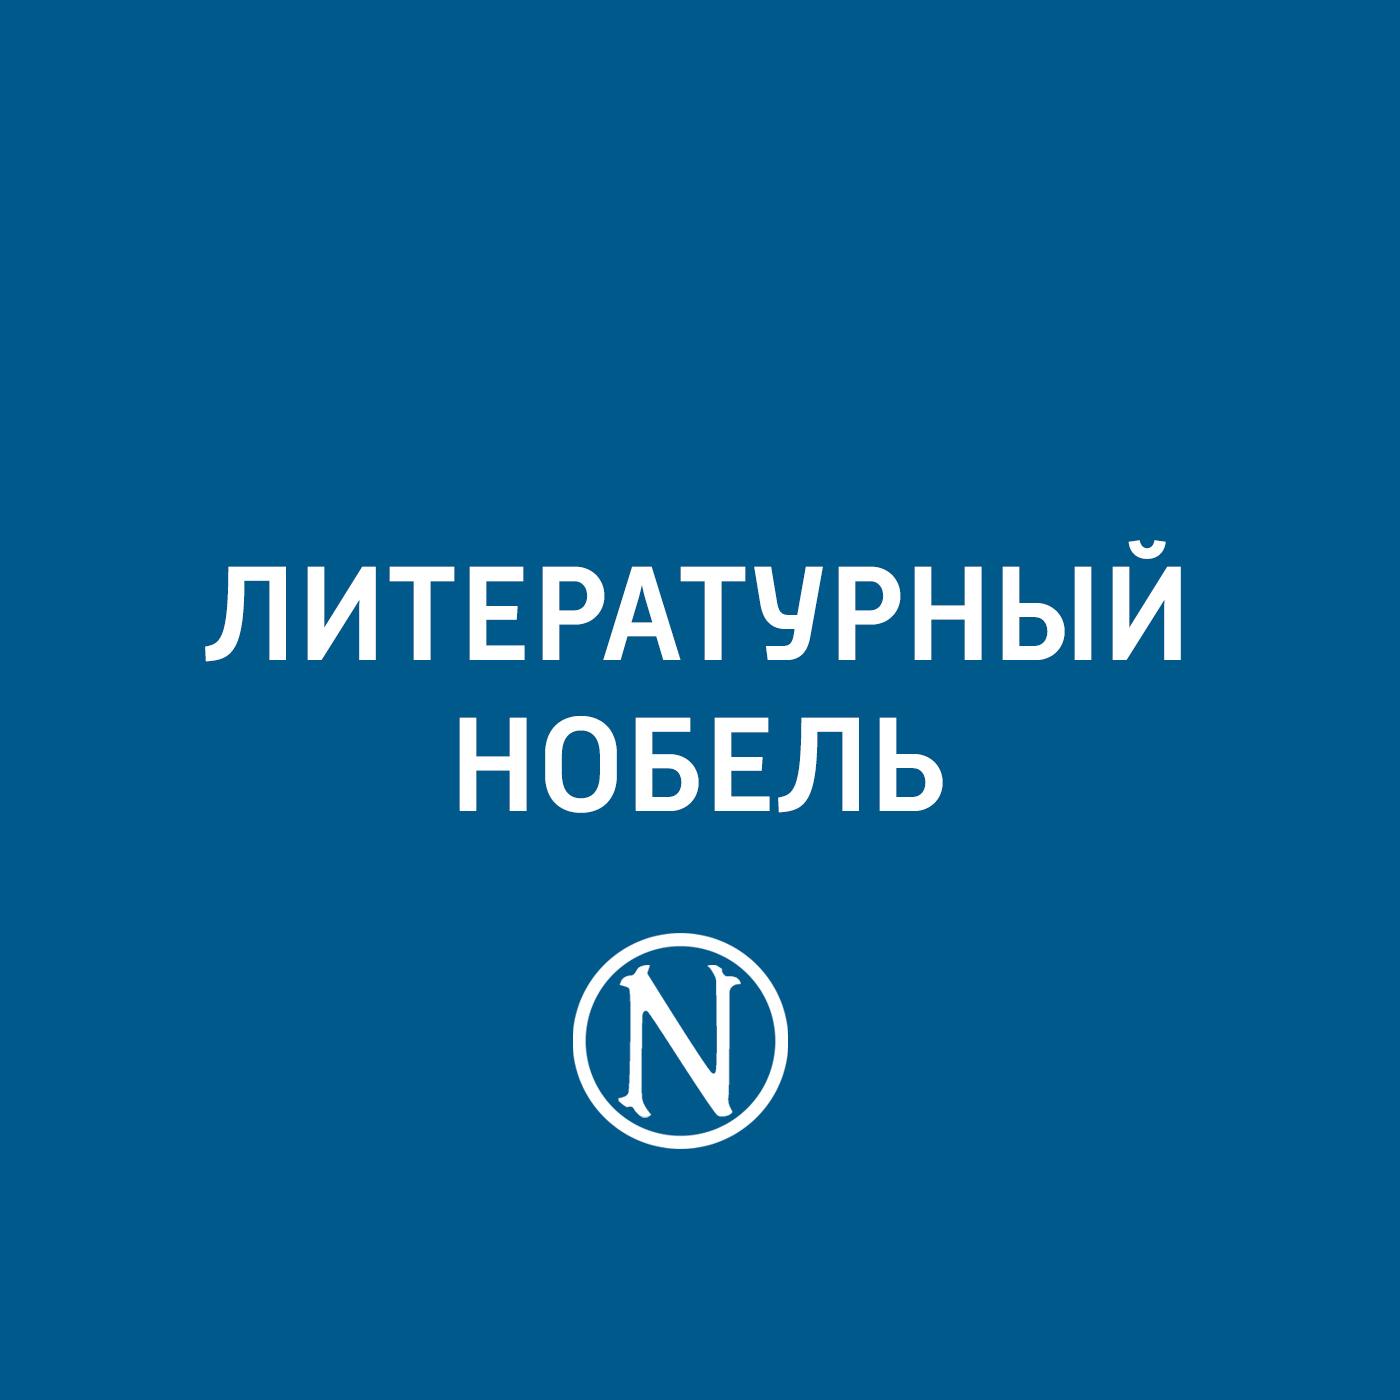 Евгений Стаховский Жан-Поль Сартр